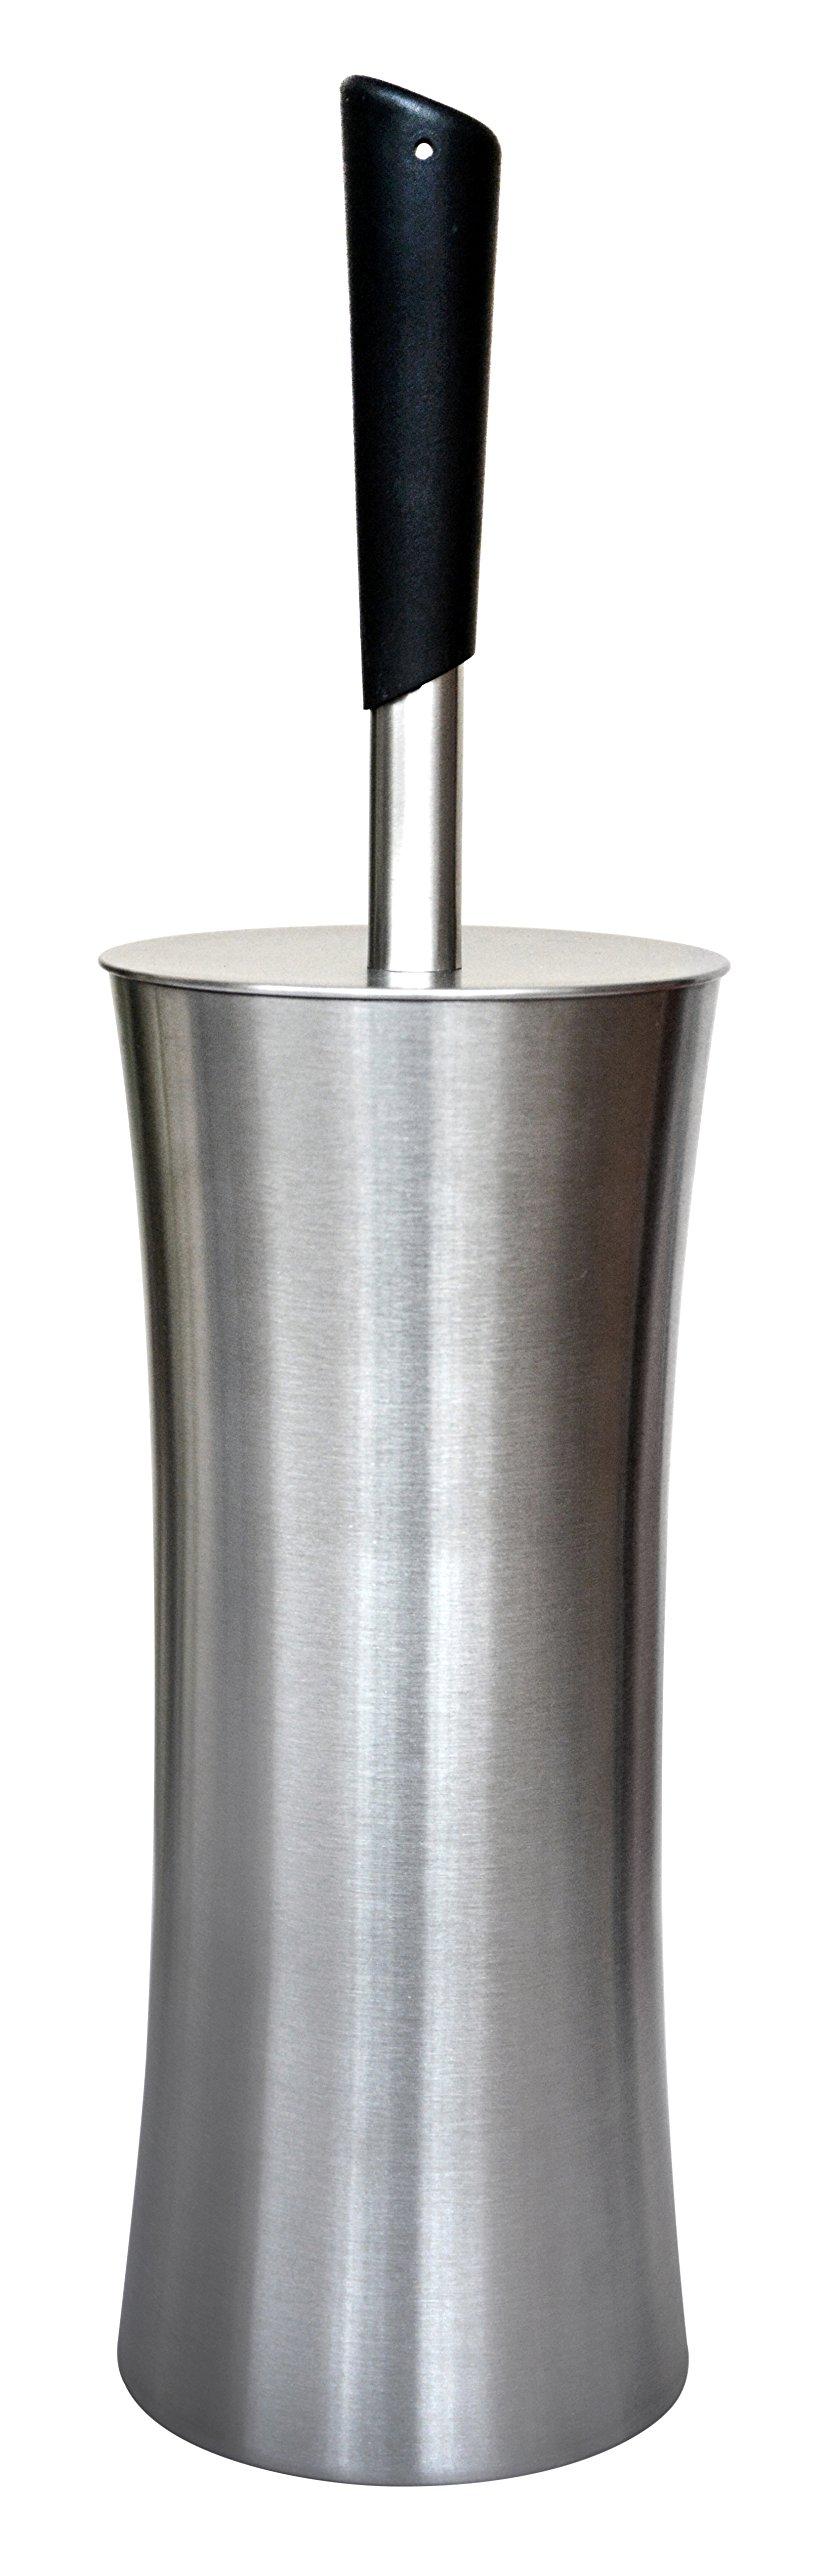 BathSense NEV1901SAT Satin Nickel Never Wet Toilet Brush Set with Holder